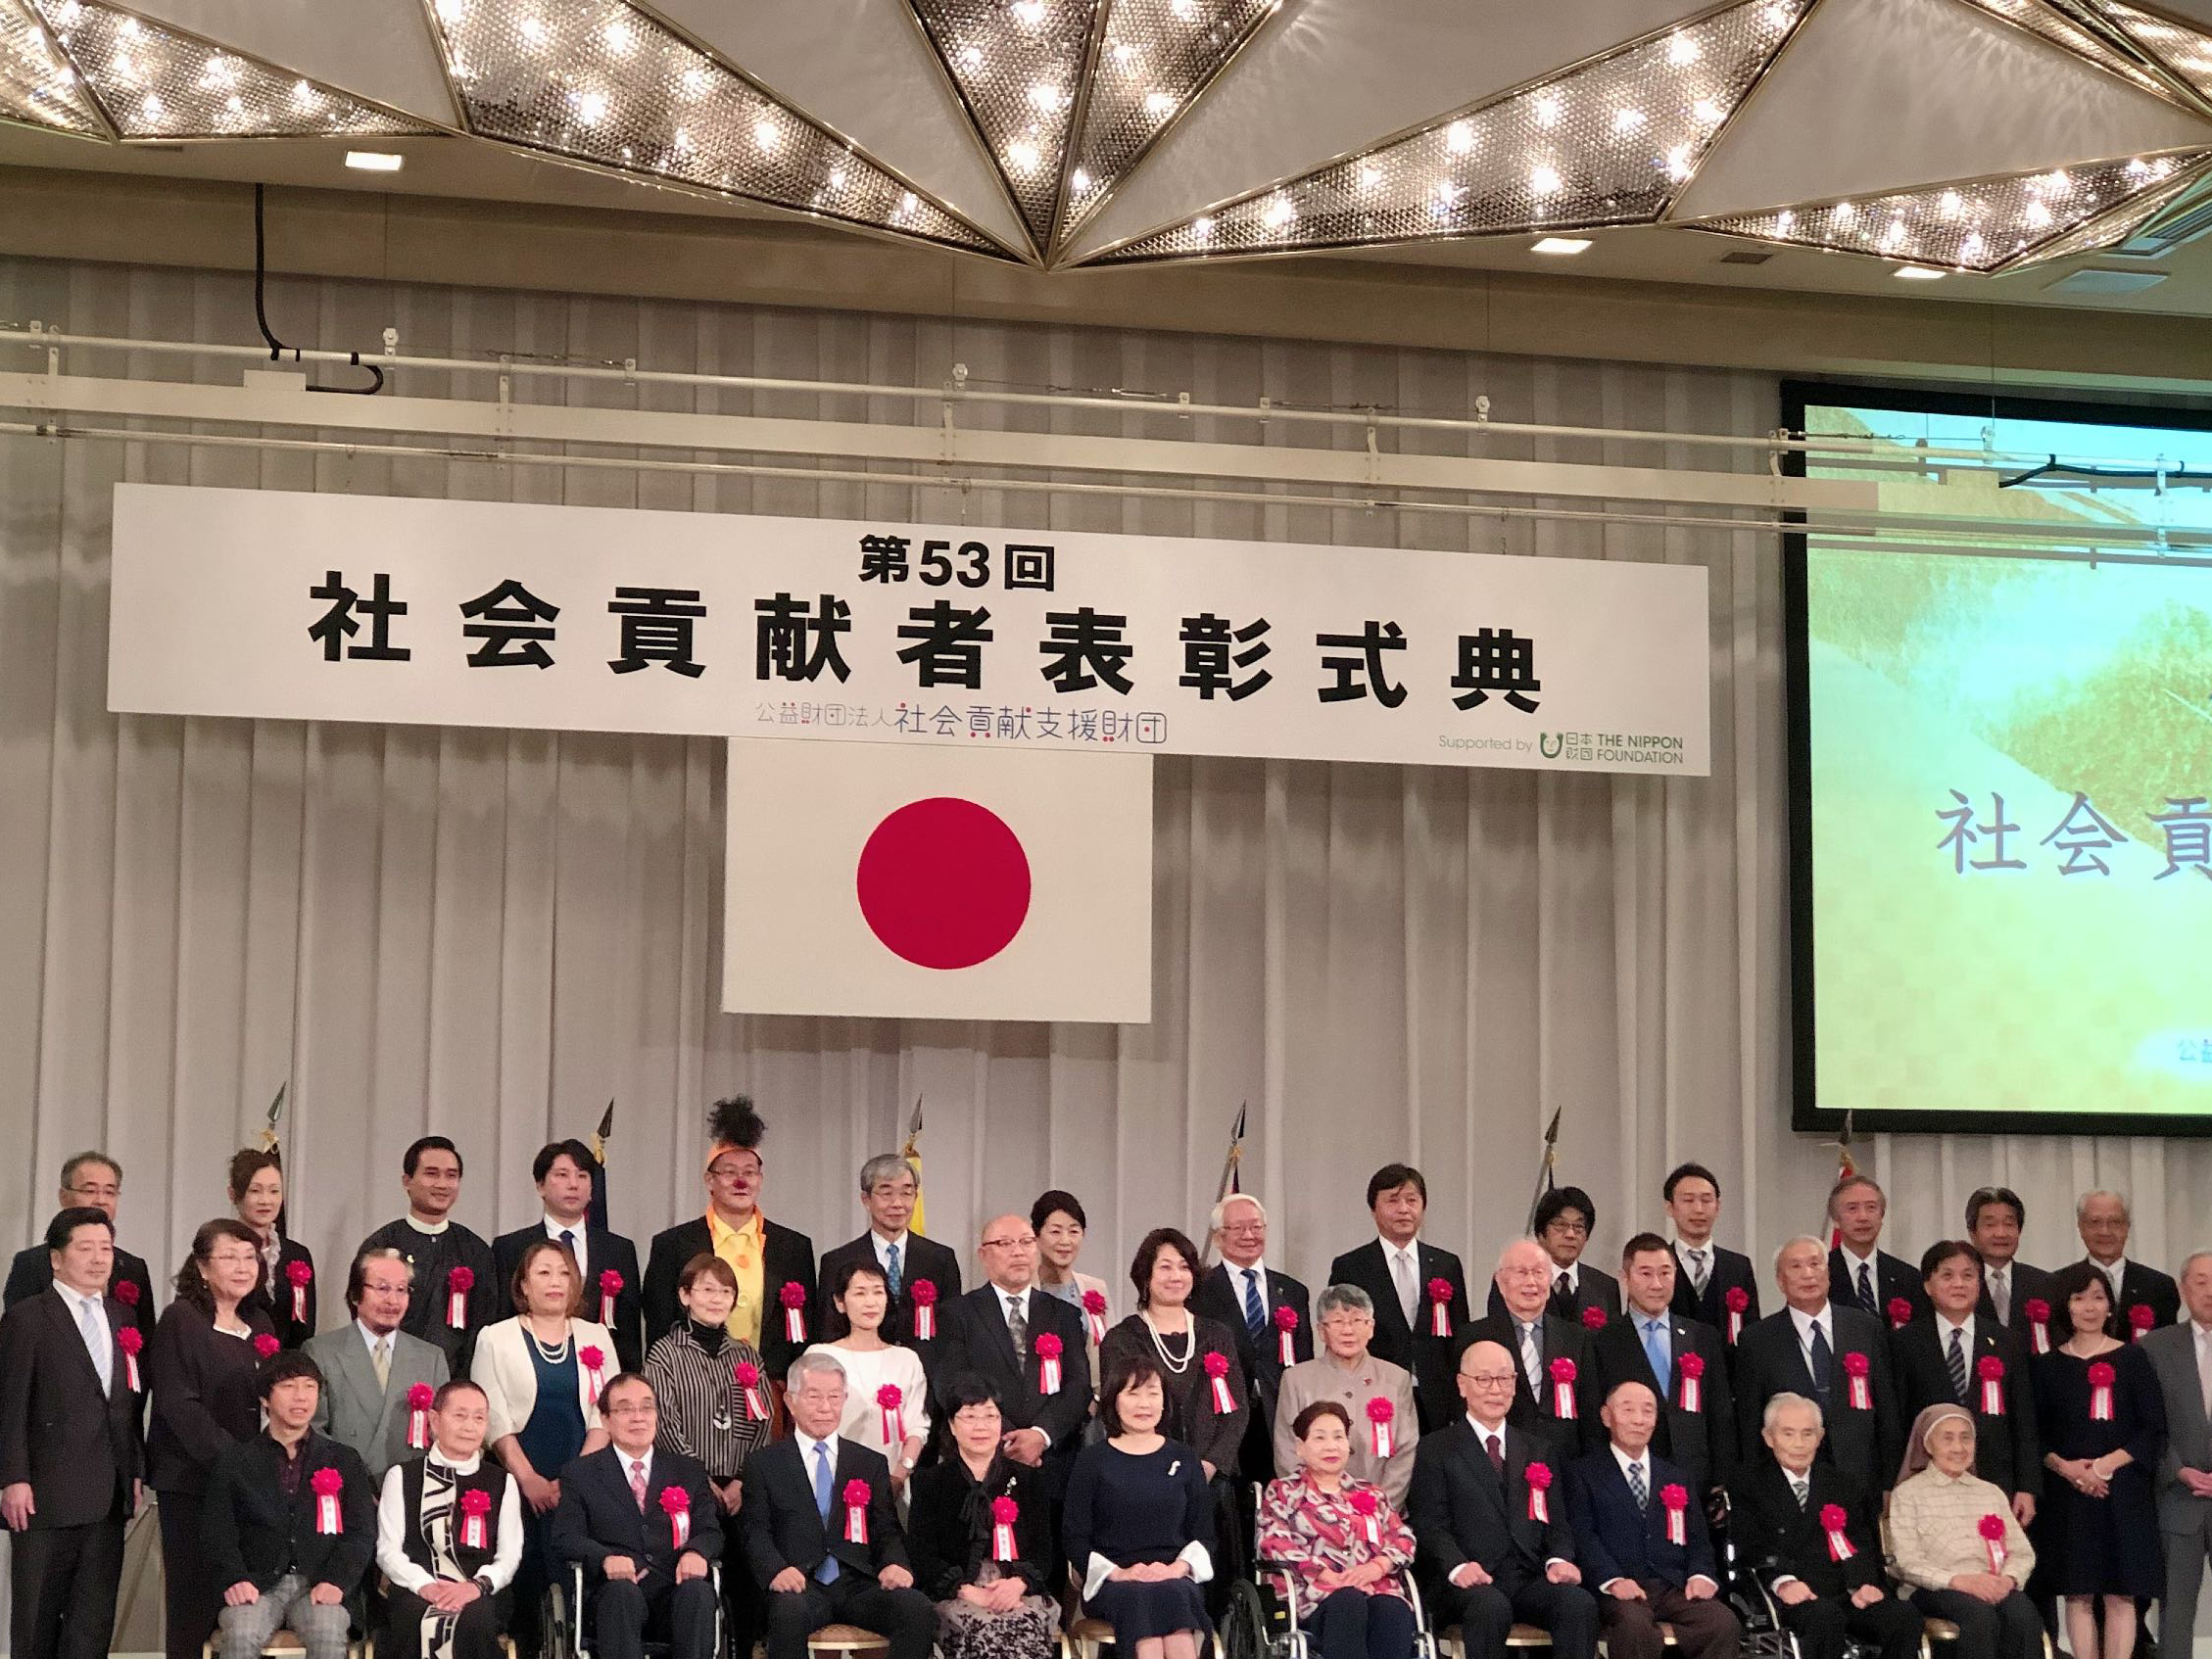 一般財団法人 阿部 亮 財団 会長 阿部亮が、第53回社会貢献者表彰(日本財団賞)を受賞しました。